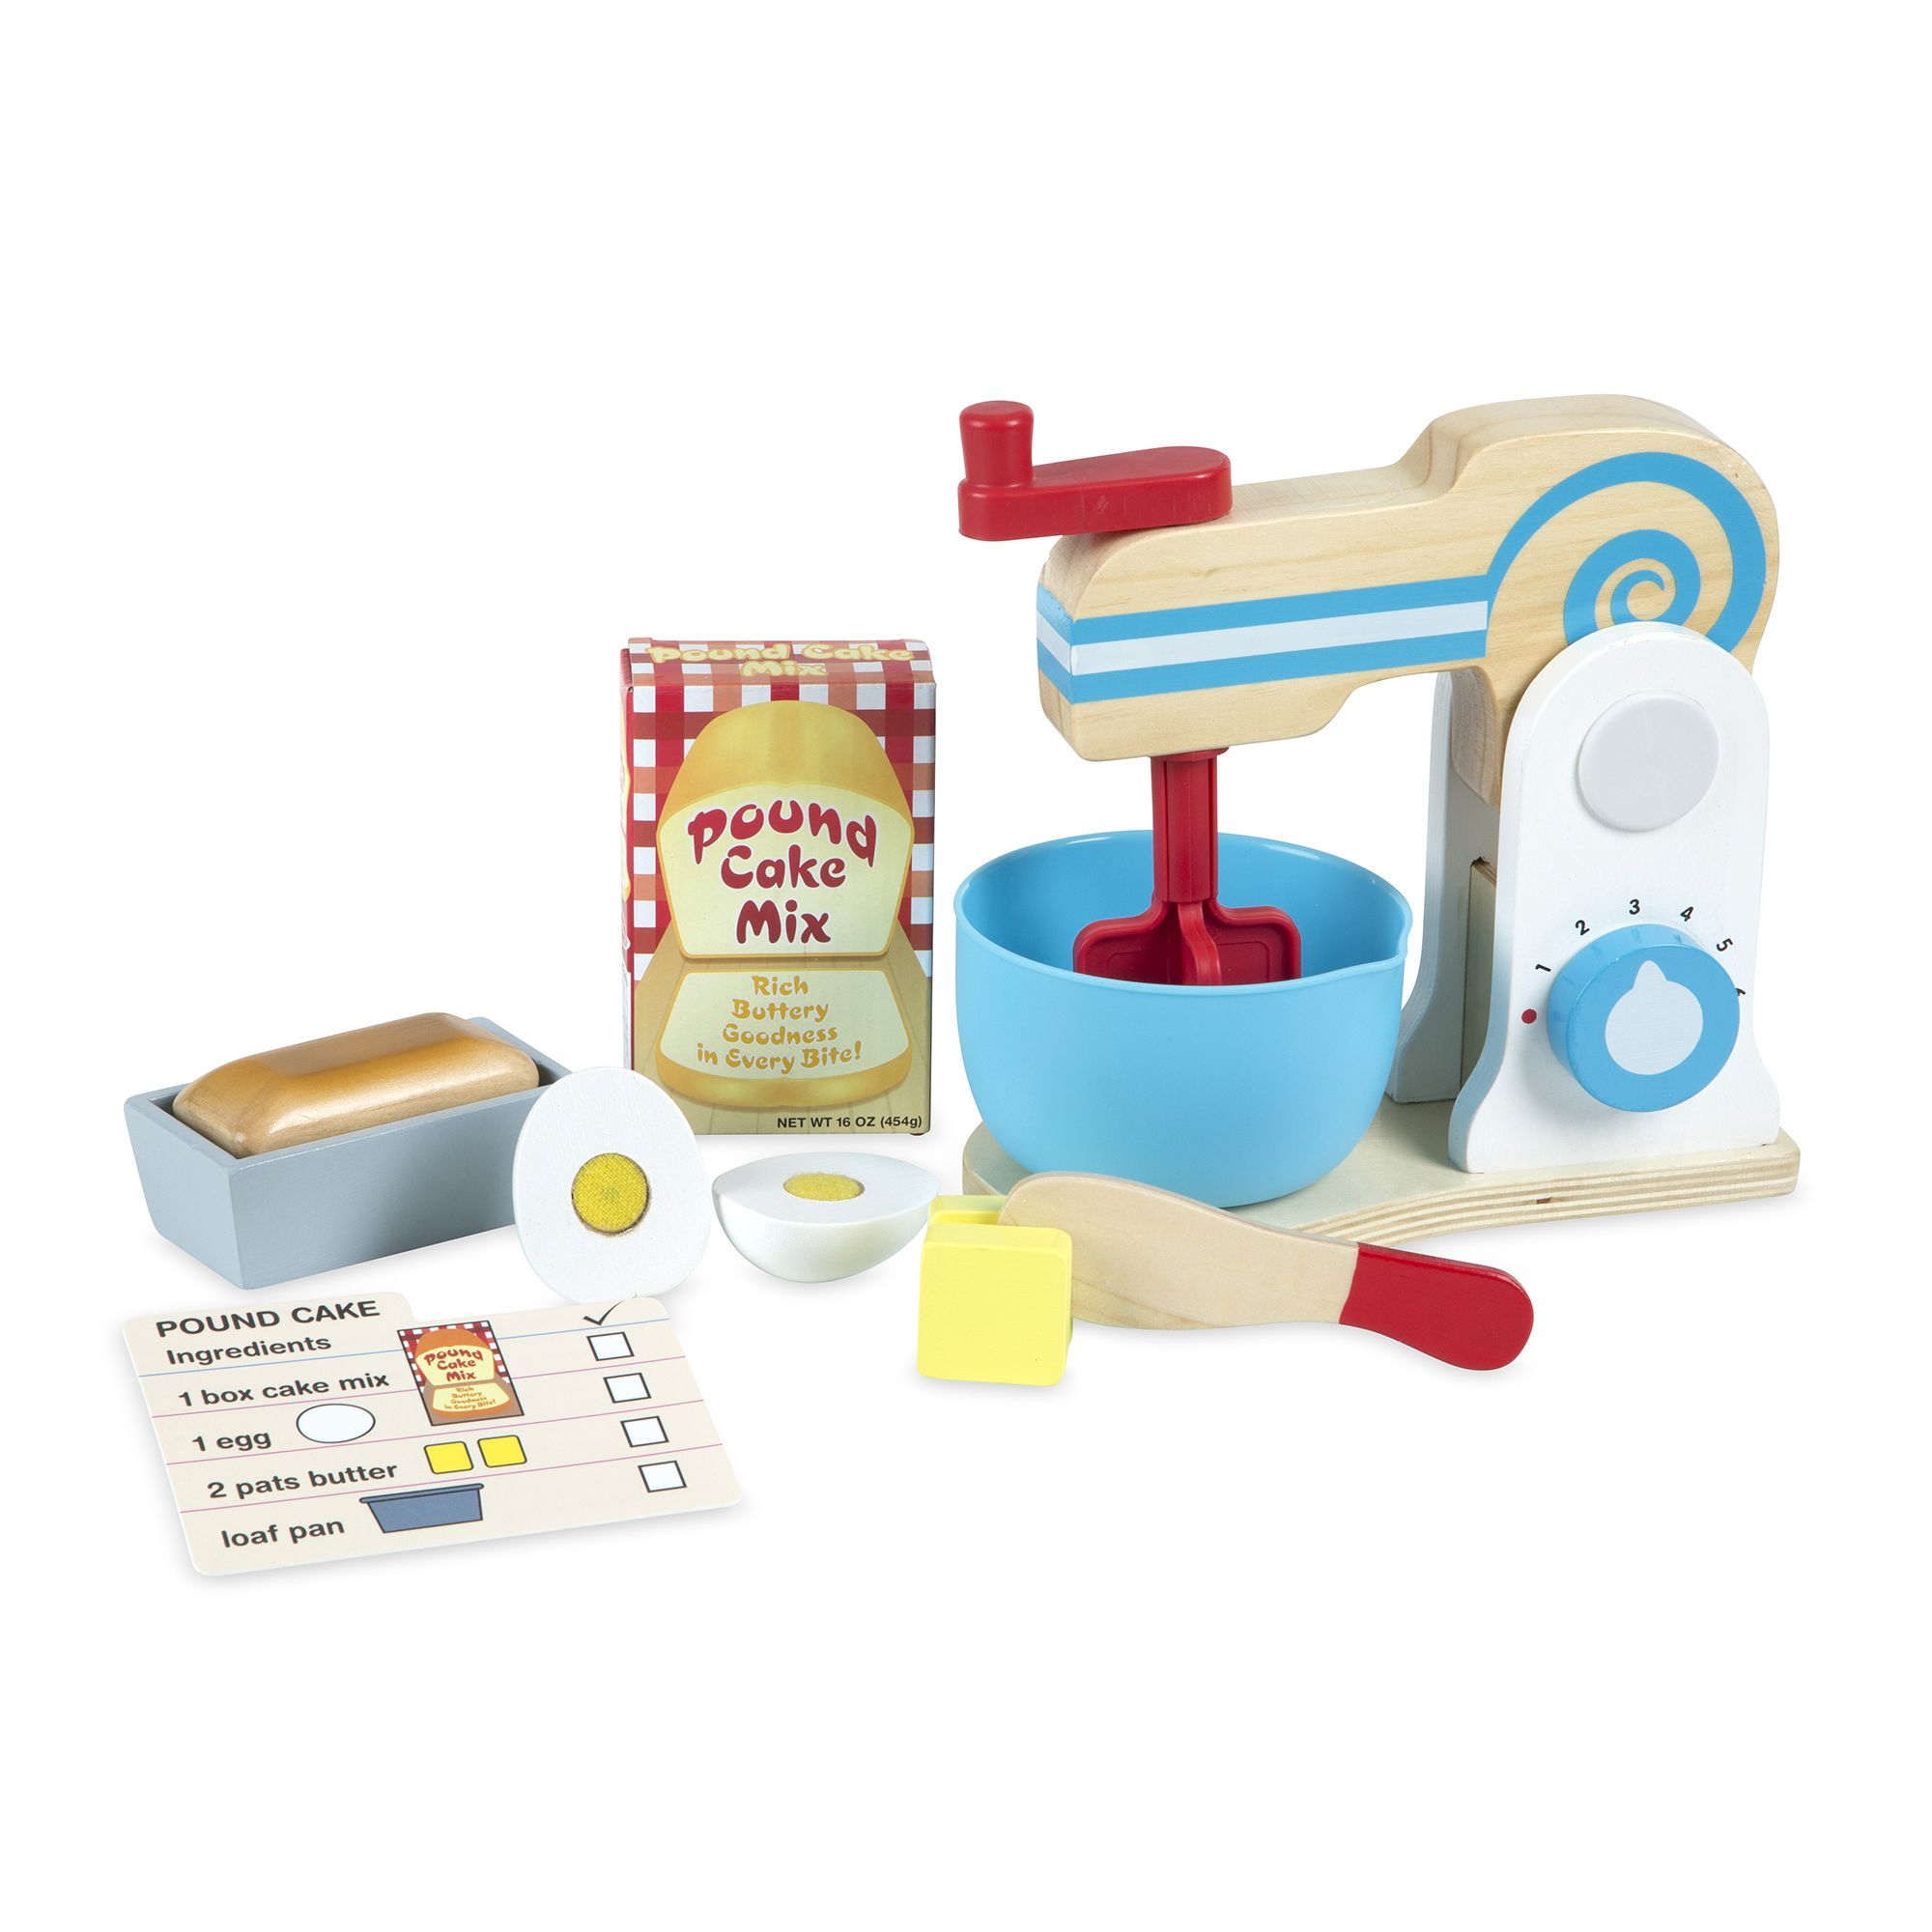 Melissa & Doug - Wooden Make-a-Cake Mixer Set (19840)